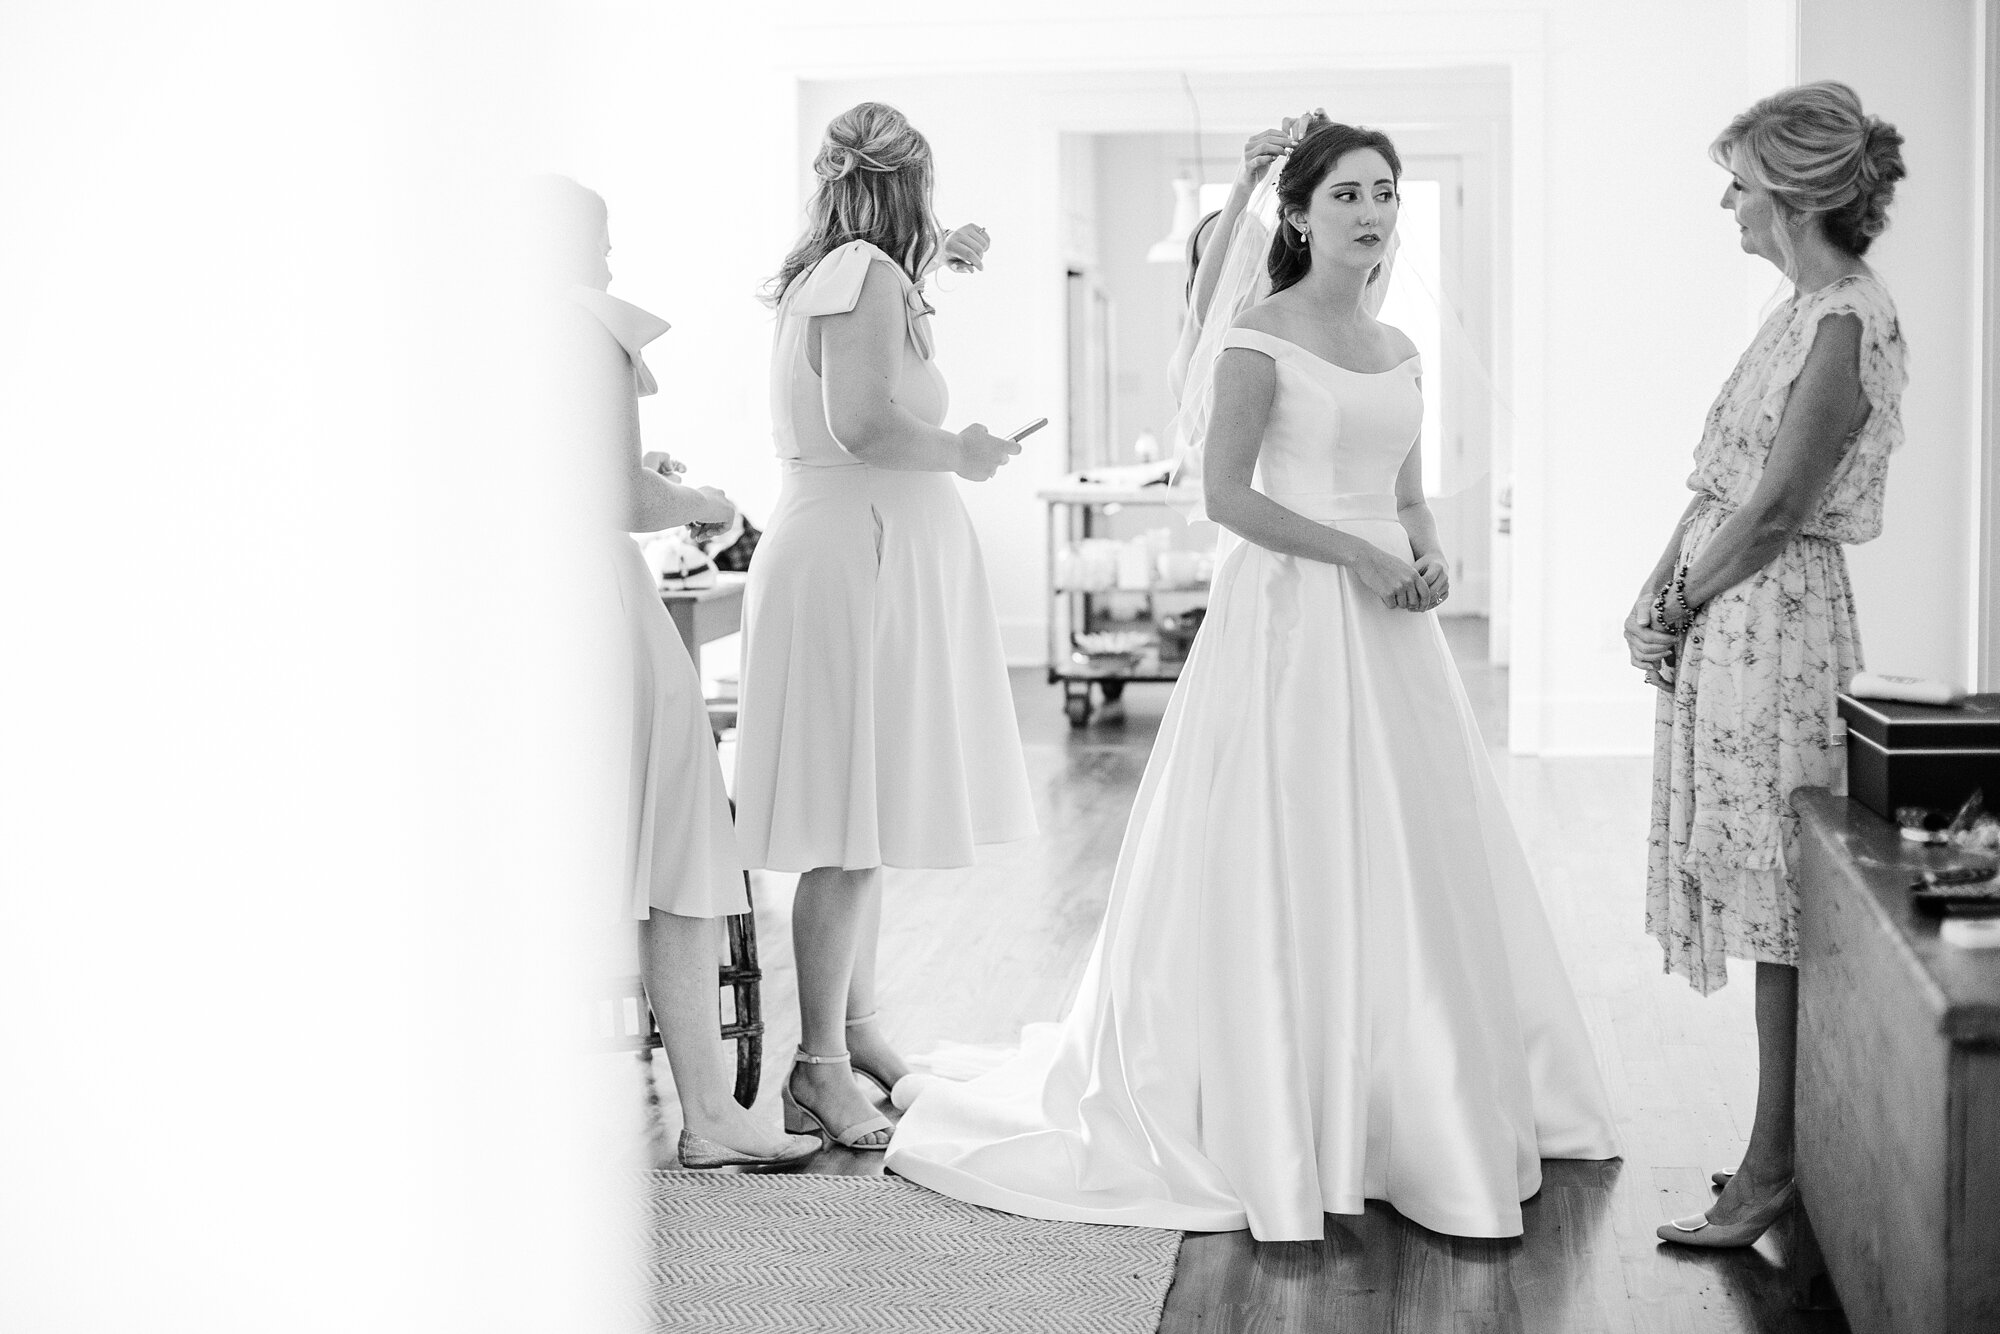 Bay_St_Louis_Wedding_Photographer_0600.jpg